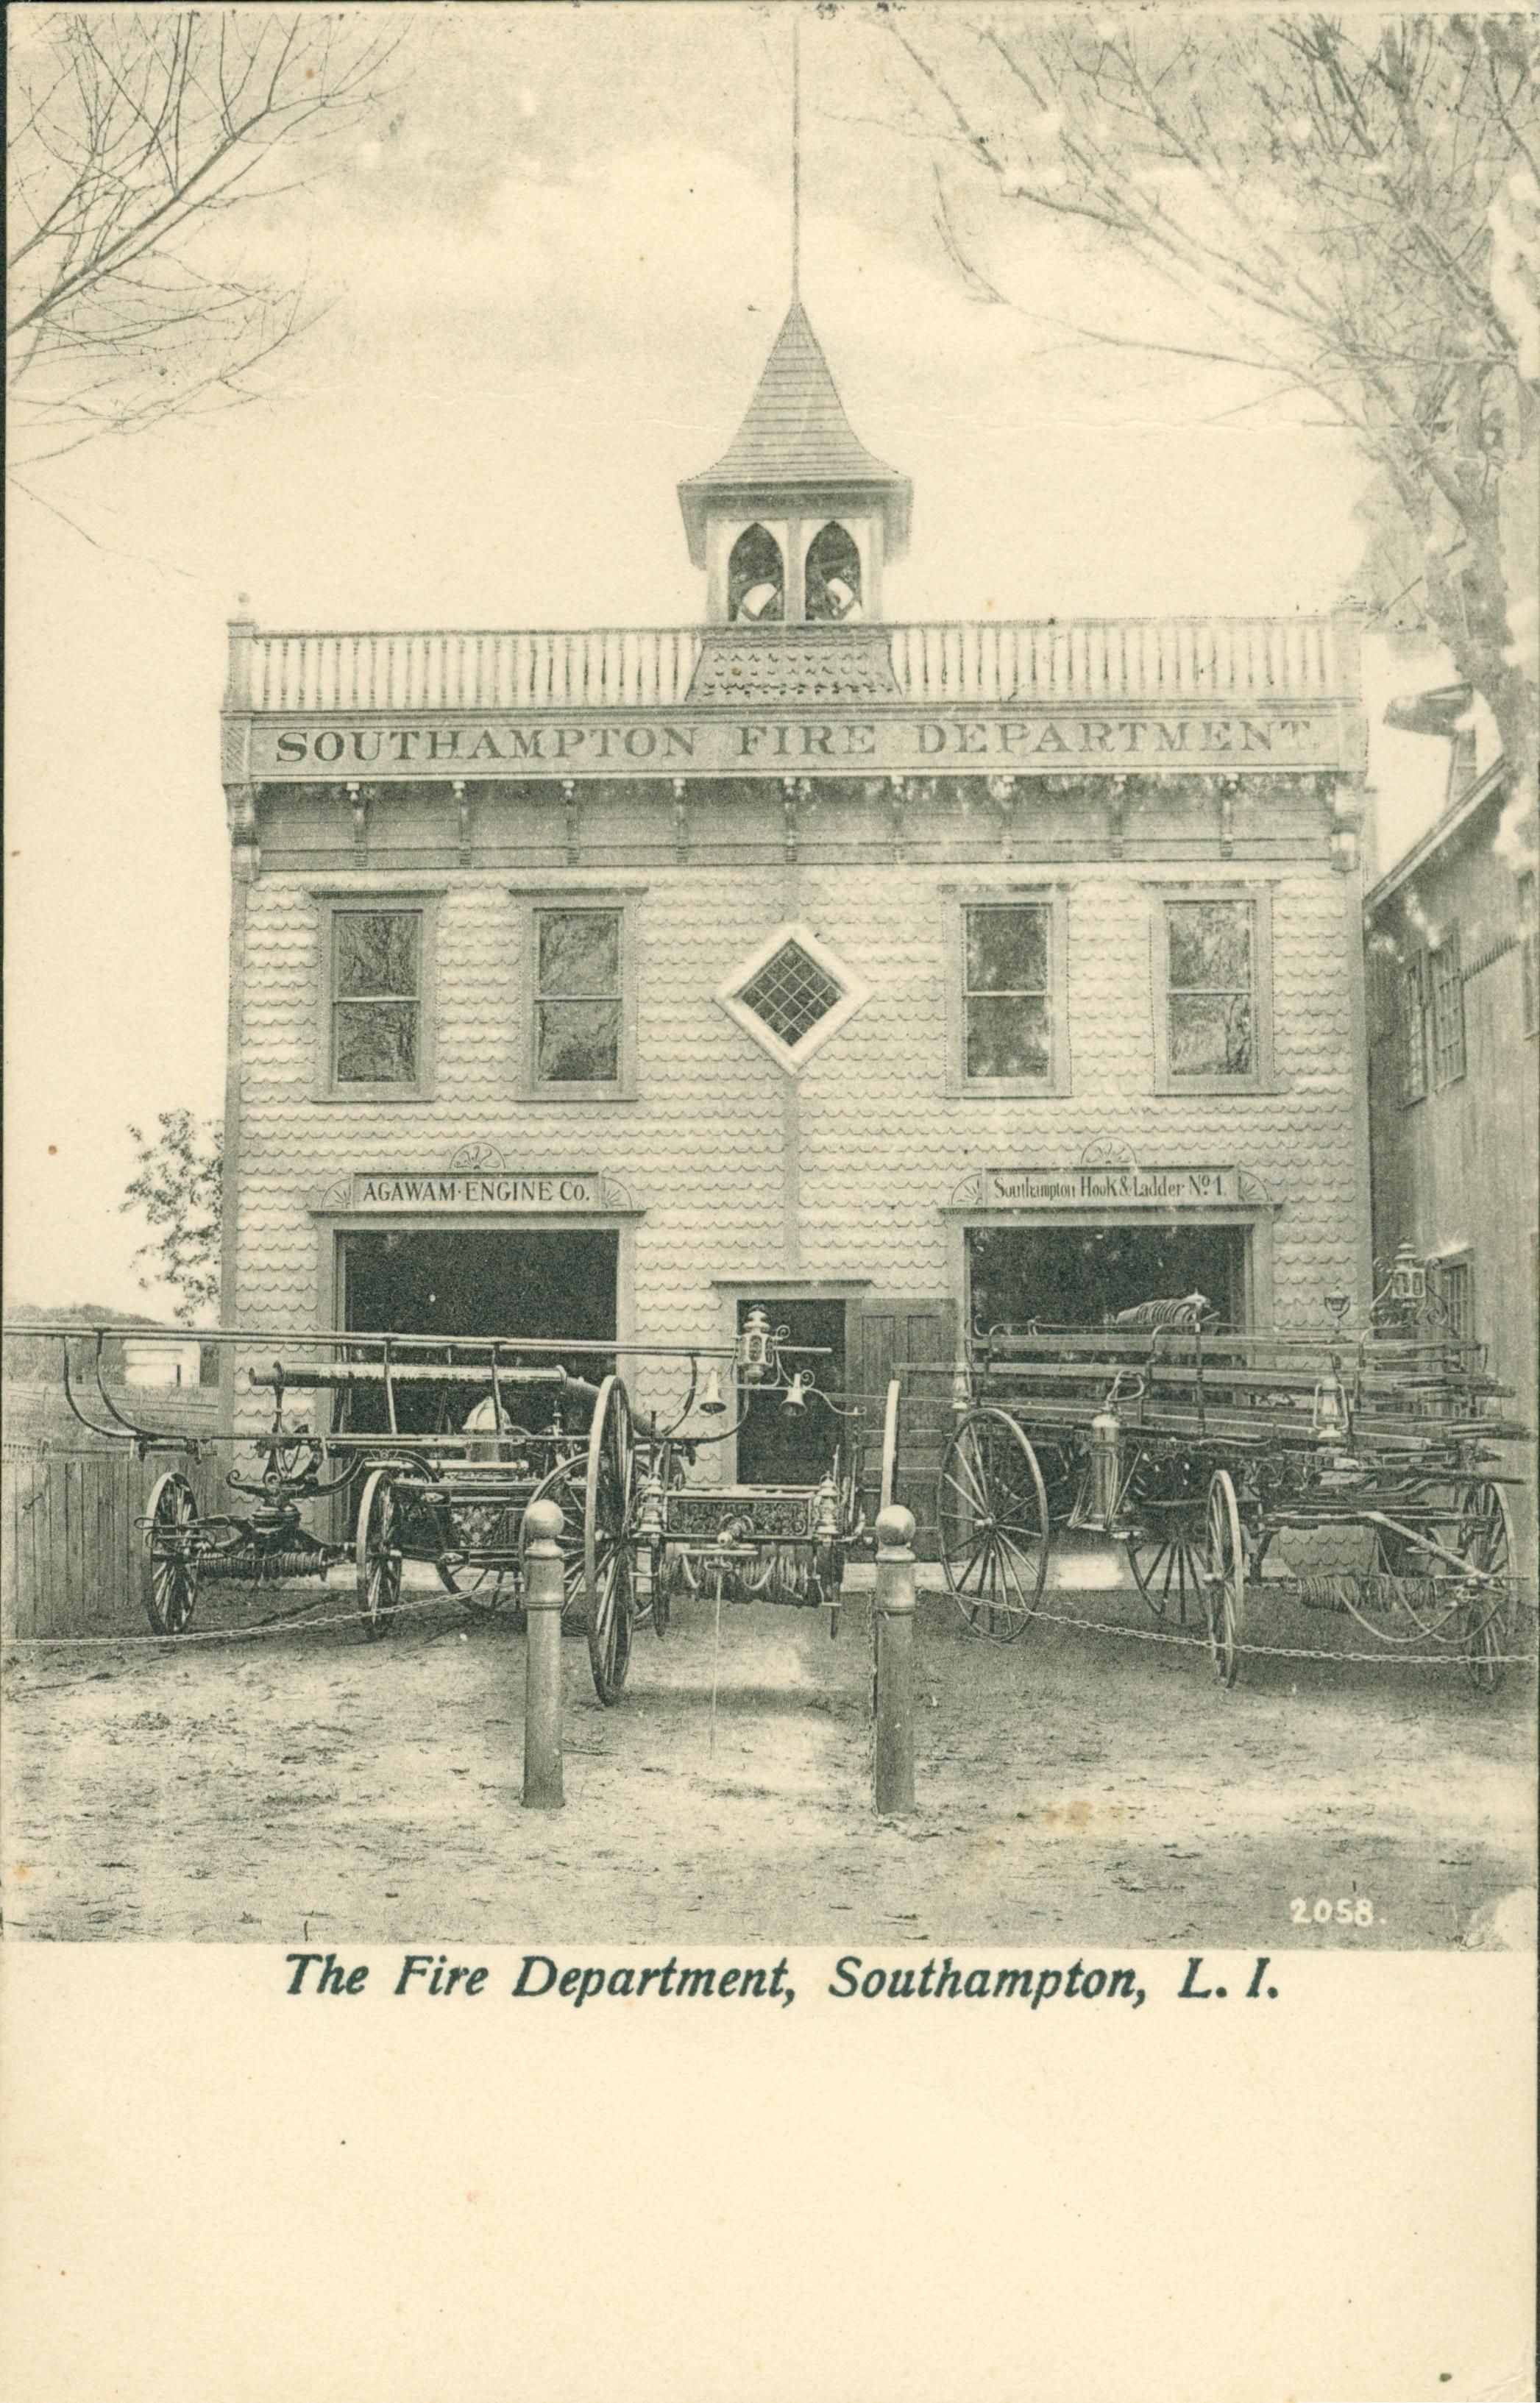 The Fire Department, Southampton, NY (Postcard